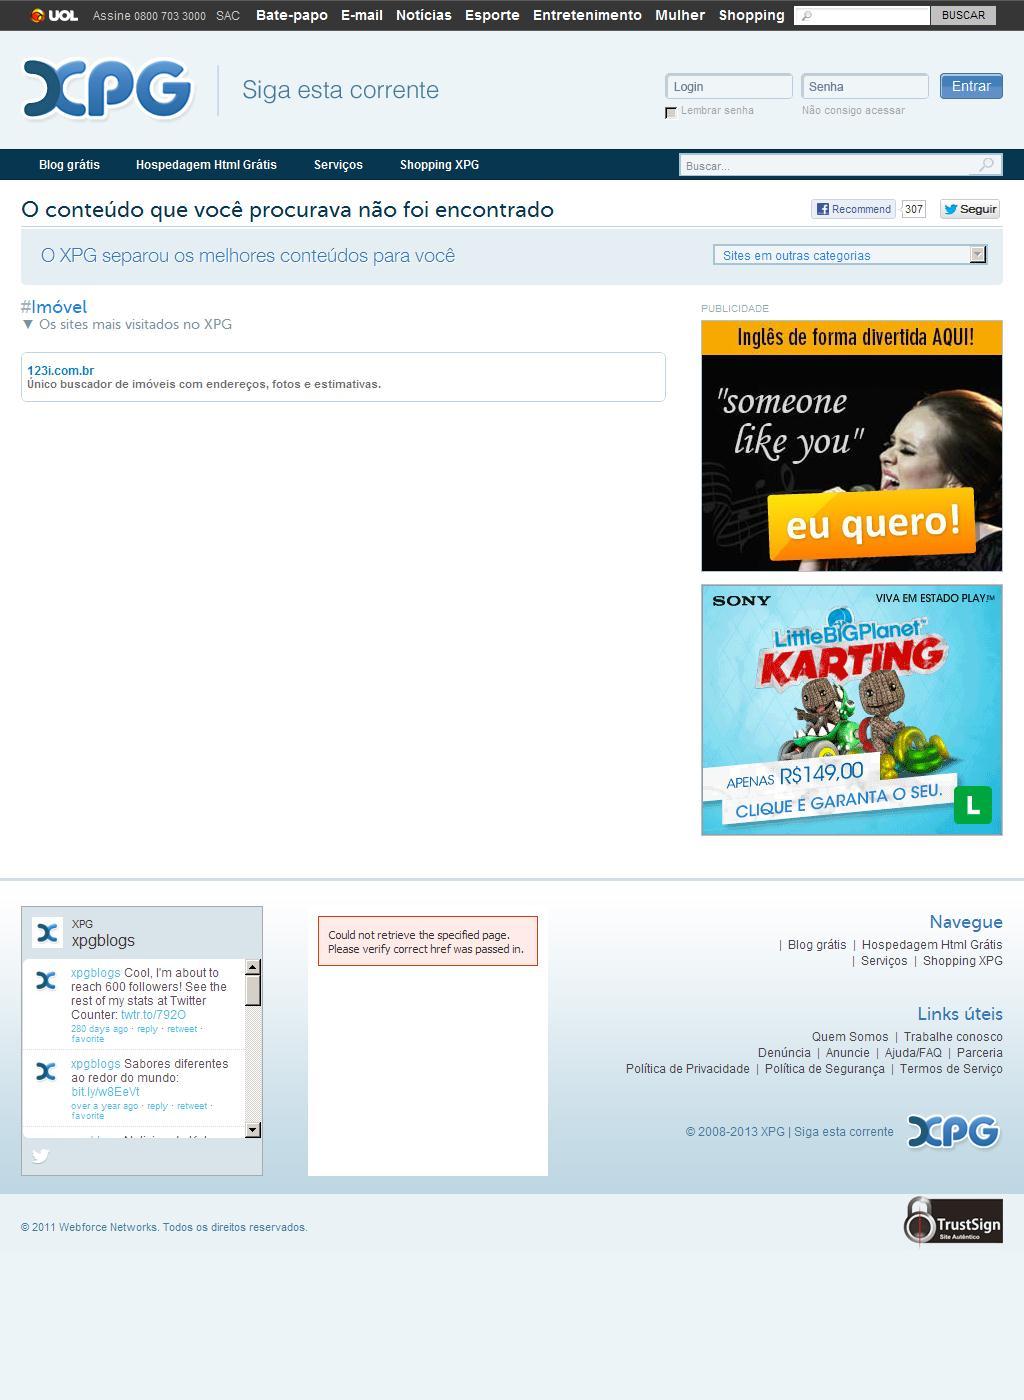 interfonia.com.br